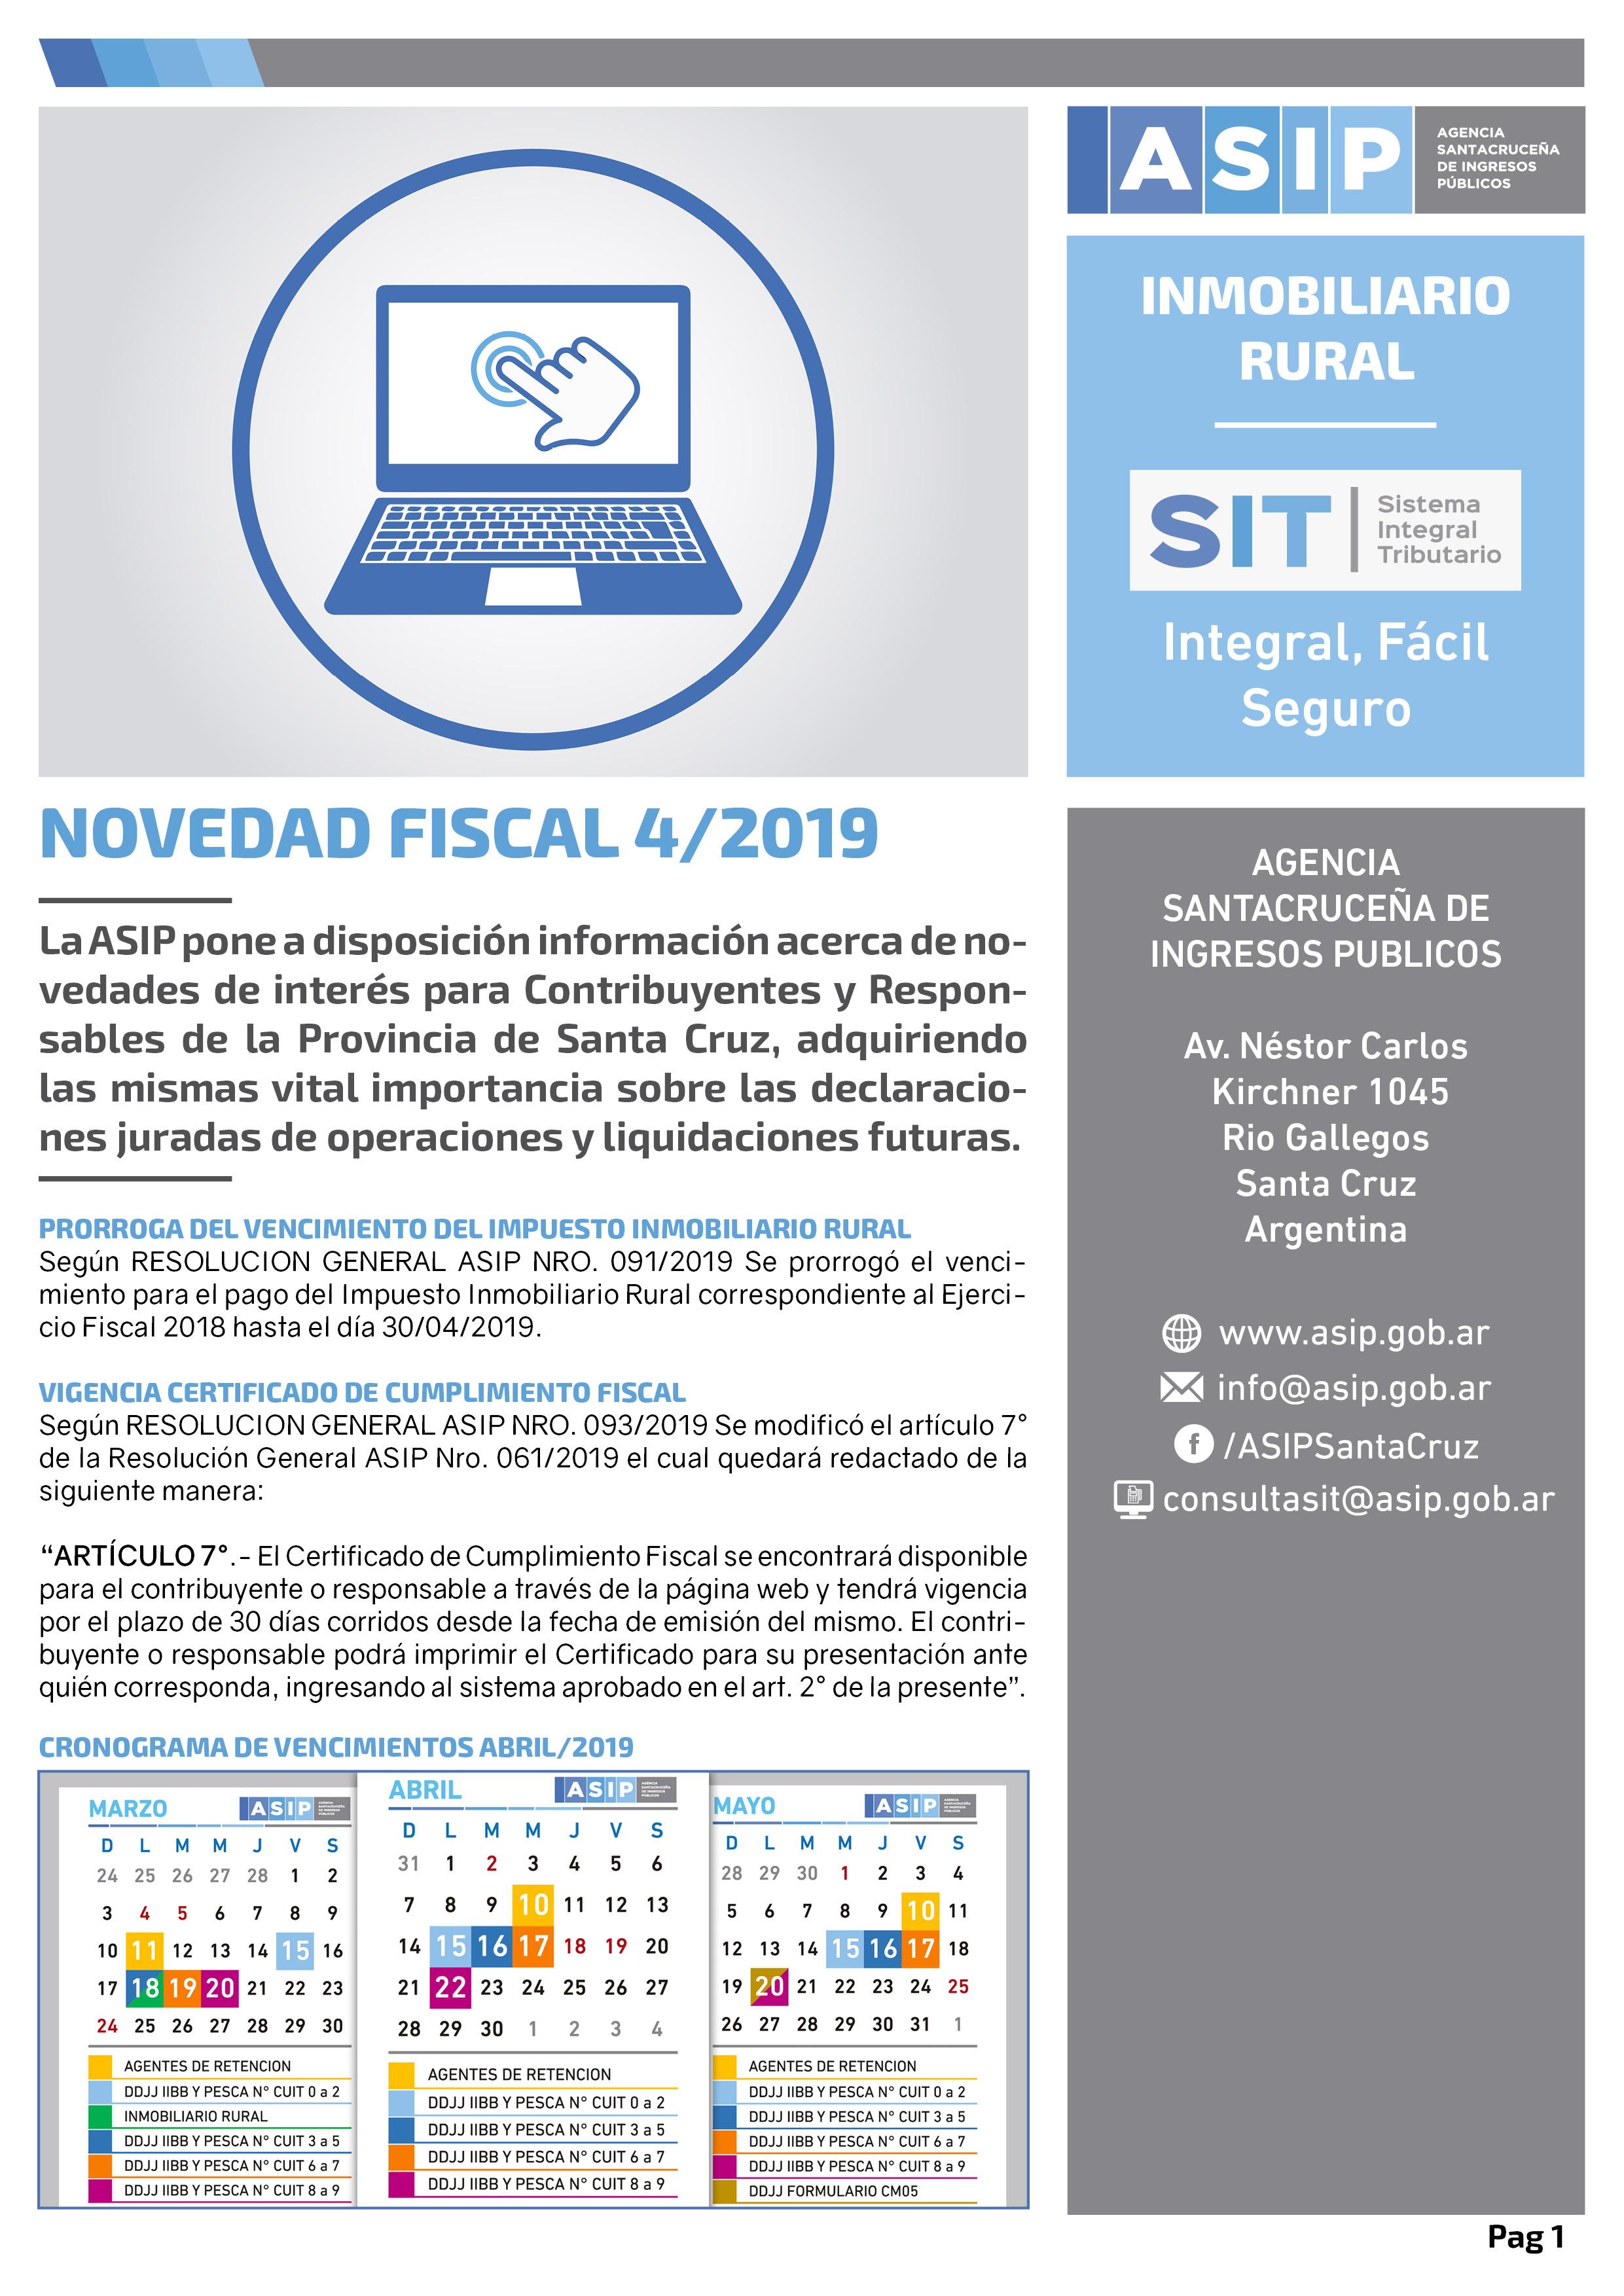 Alerta Fiscal ASIP 4-2019